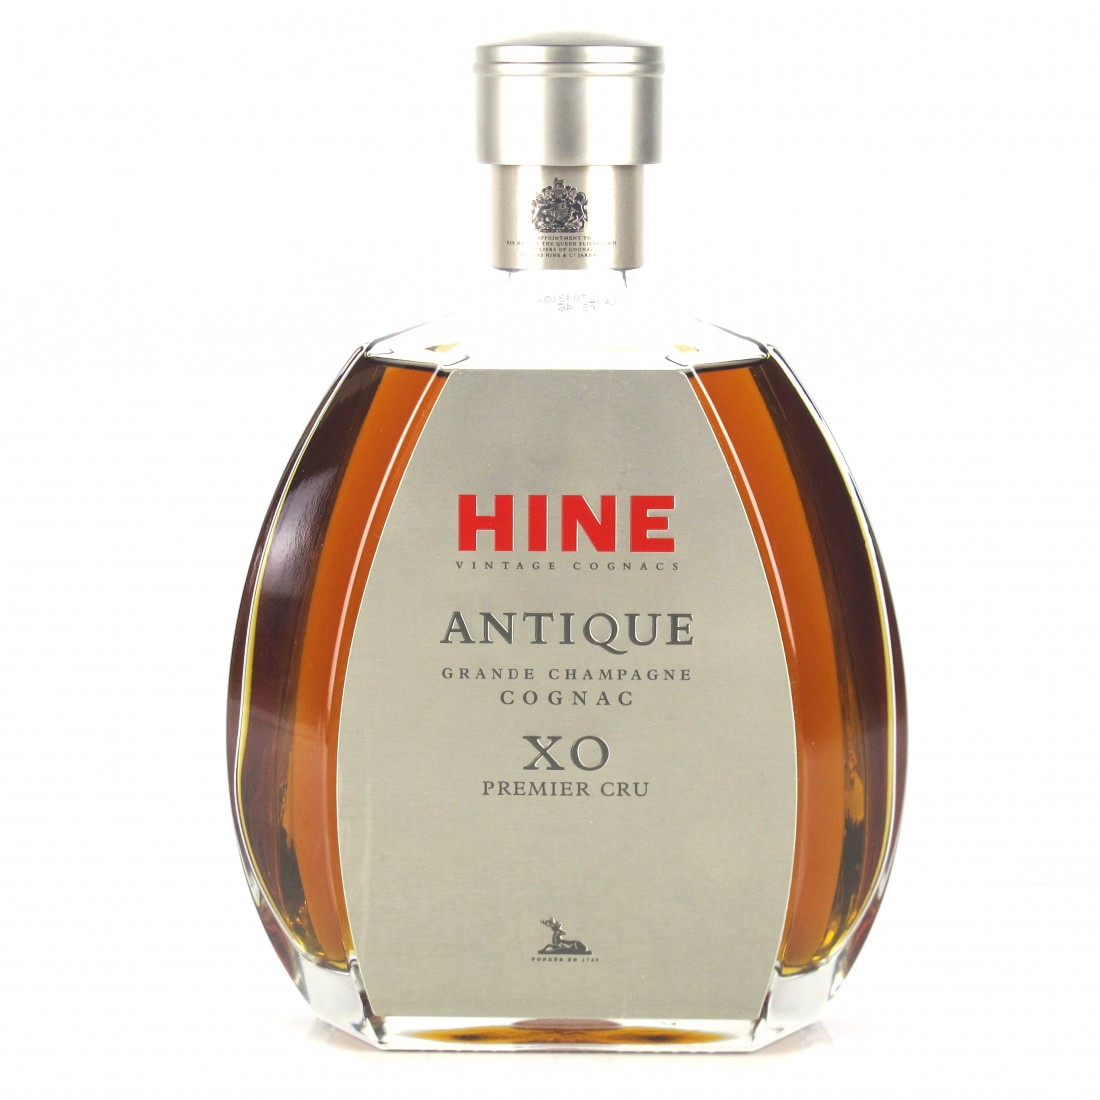 Hine Antique XO Premier Cru Grand Champagne Cognac